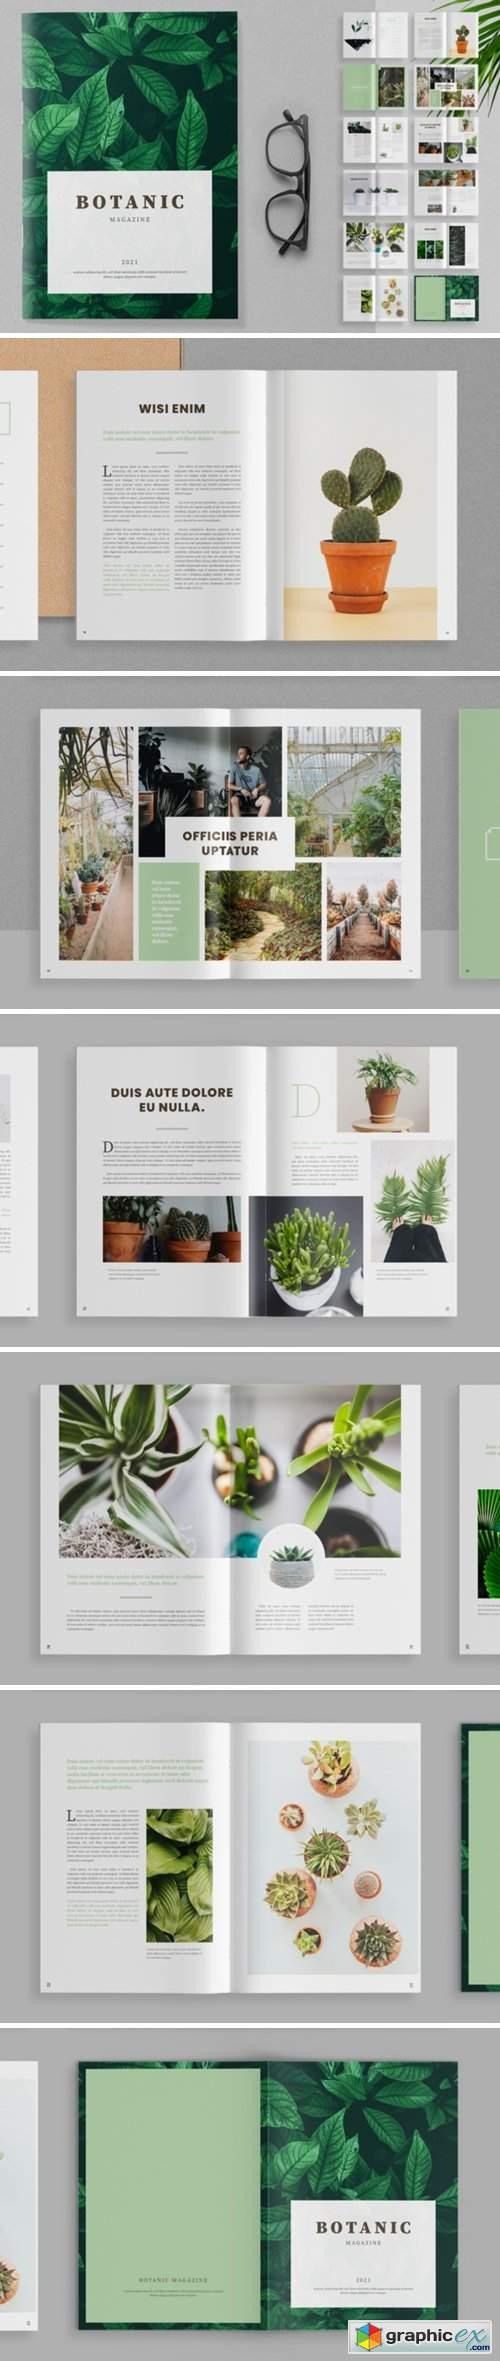 Botanic Magazine Template